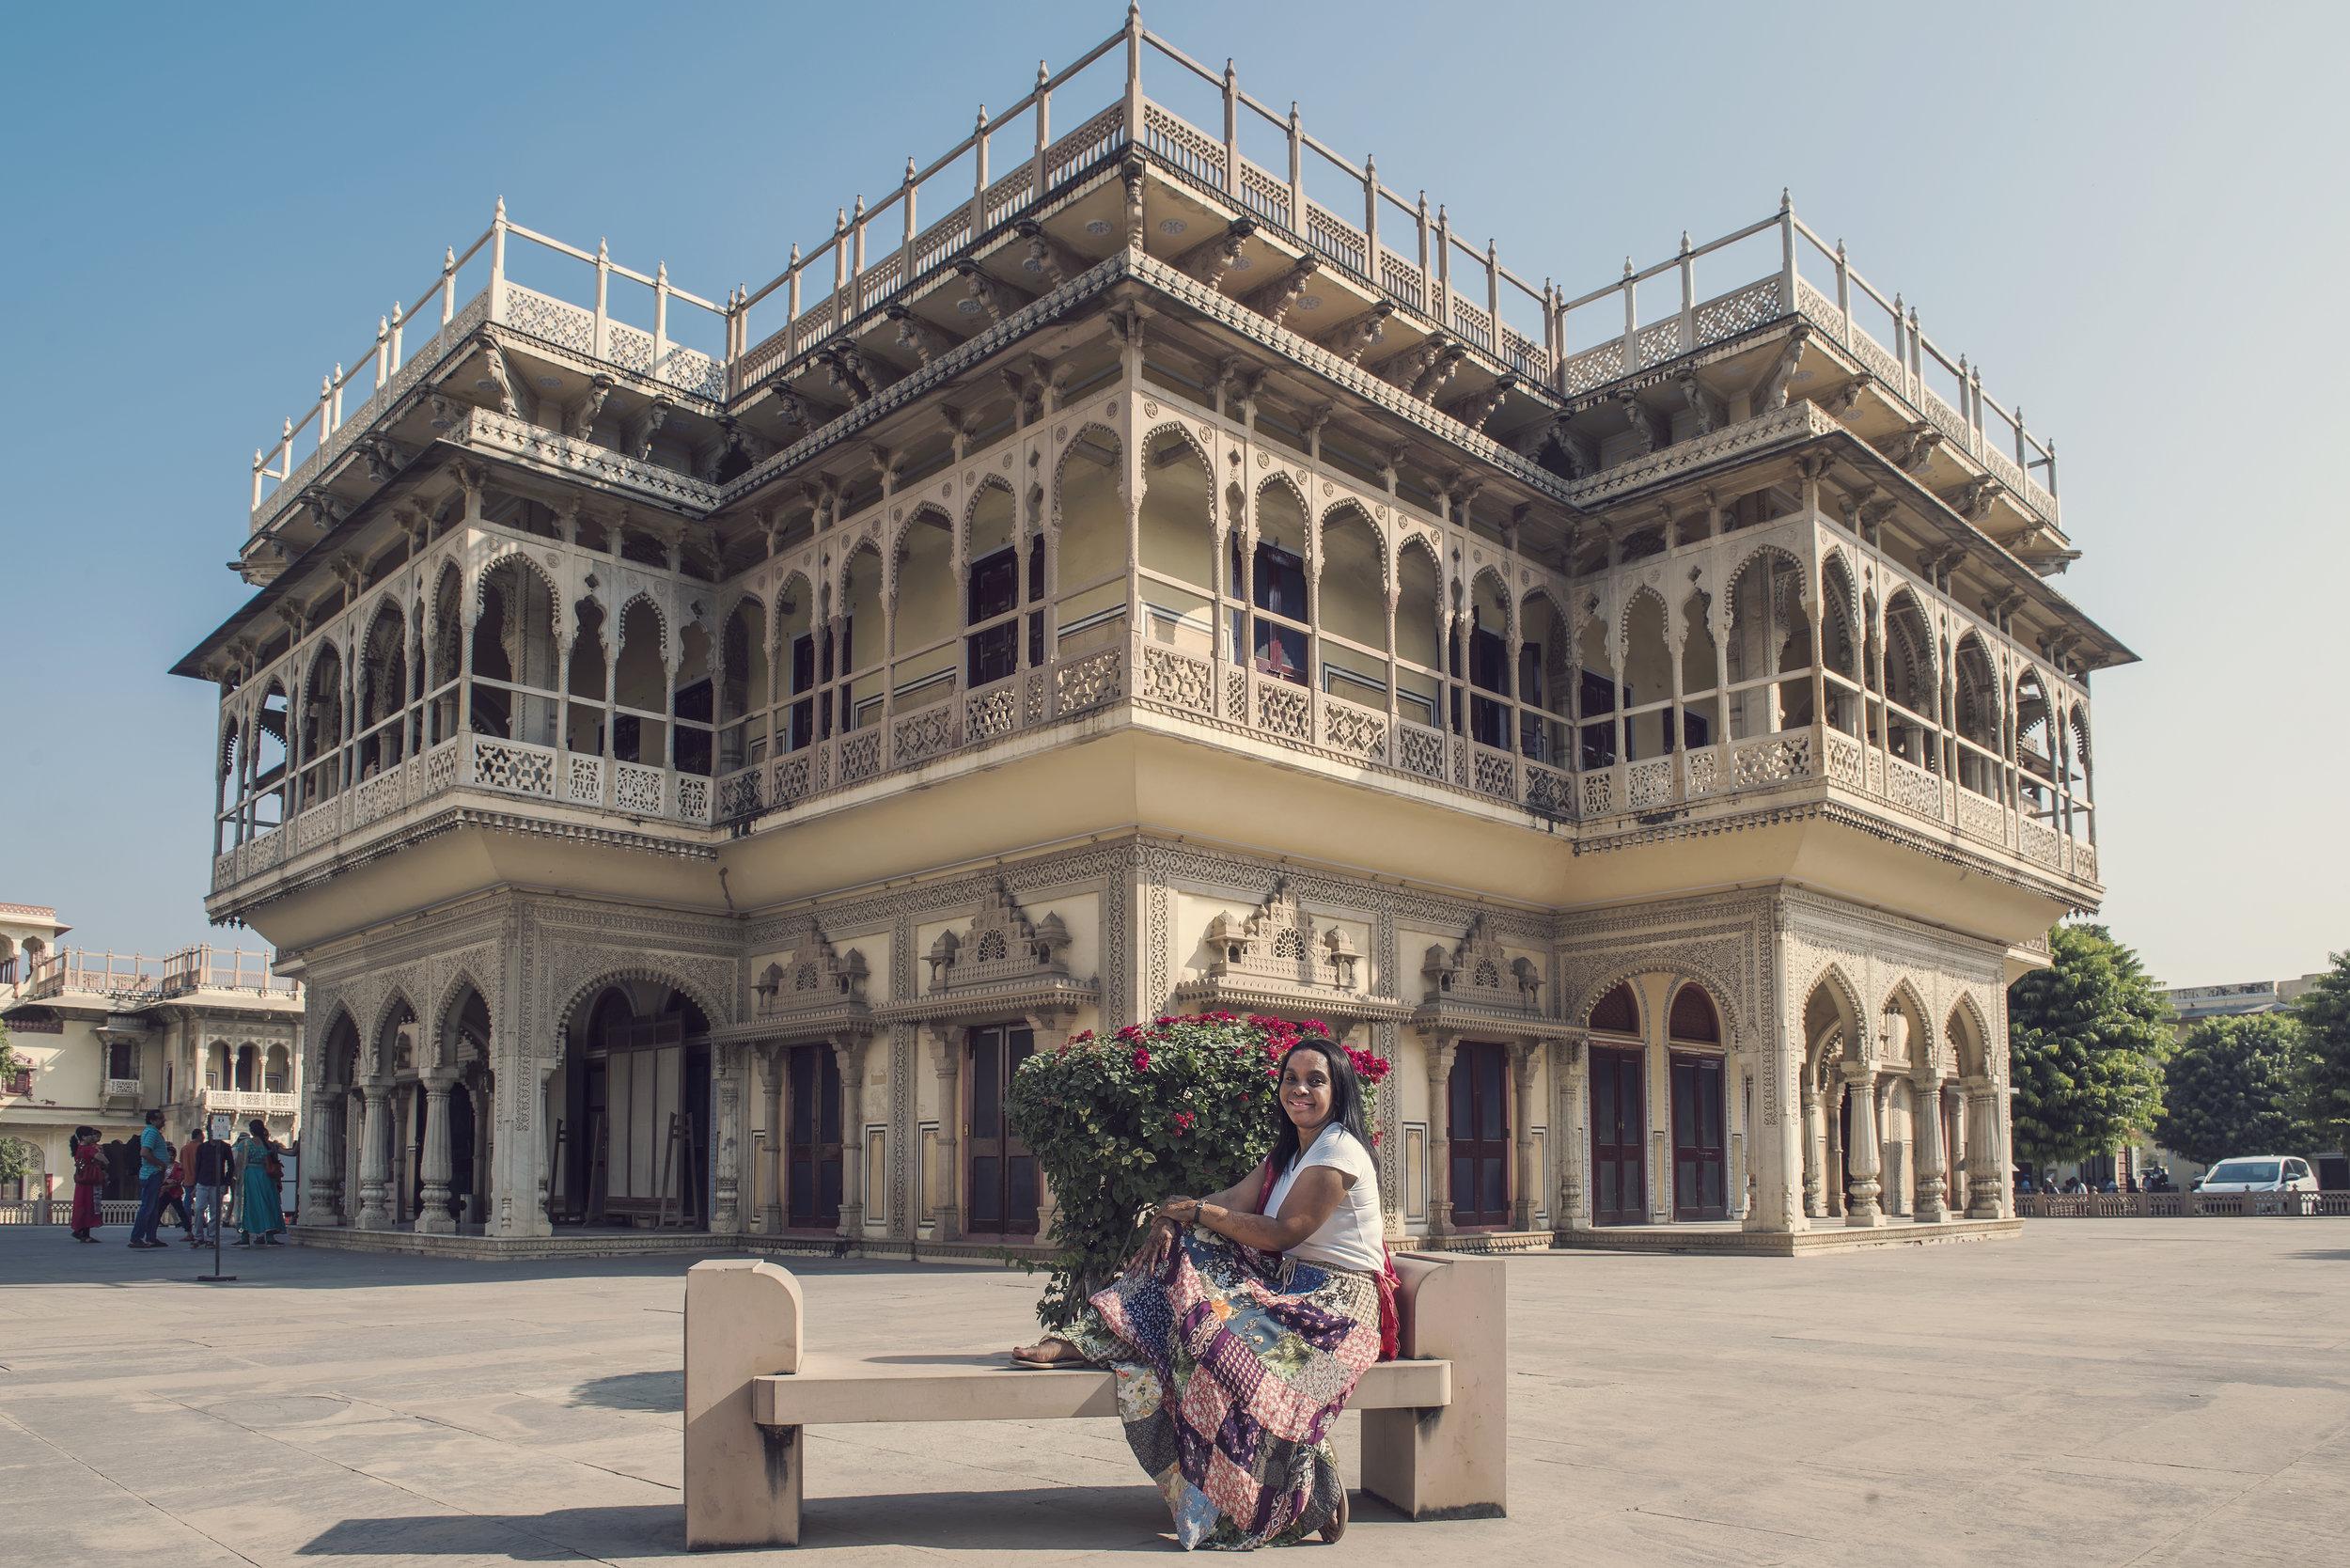 Photo by: Shoot My Travel Photographer  Vinod  in Jaipur